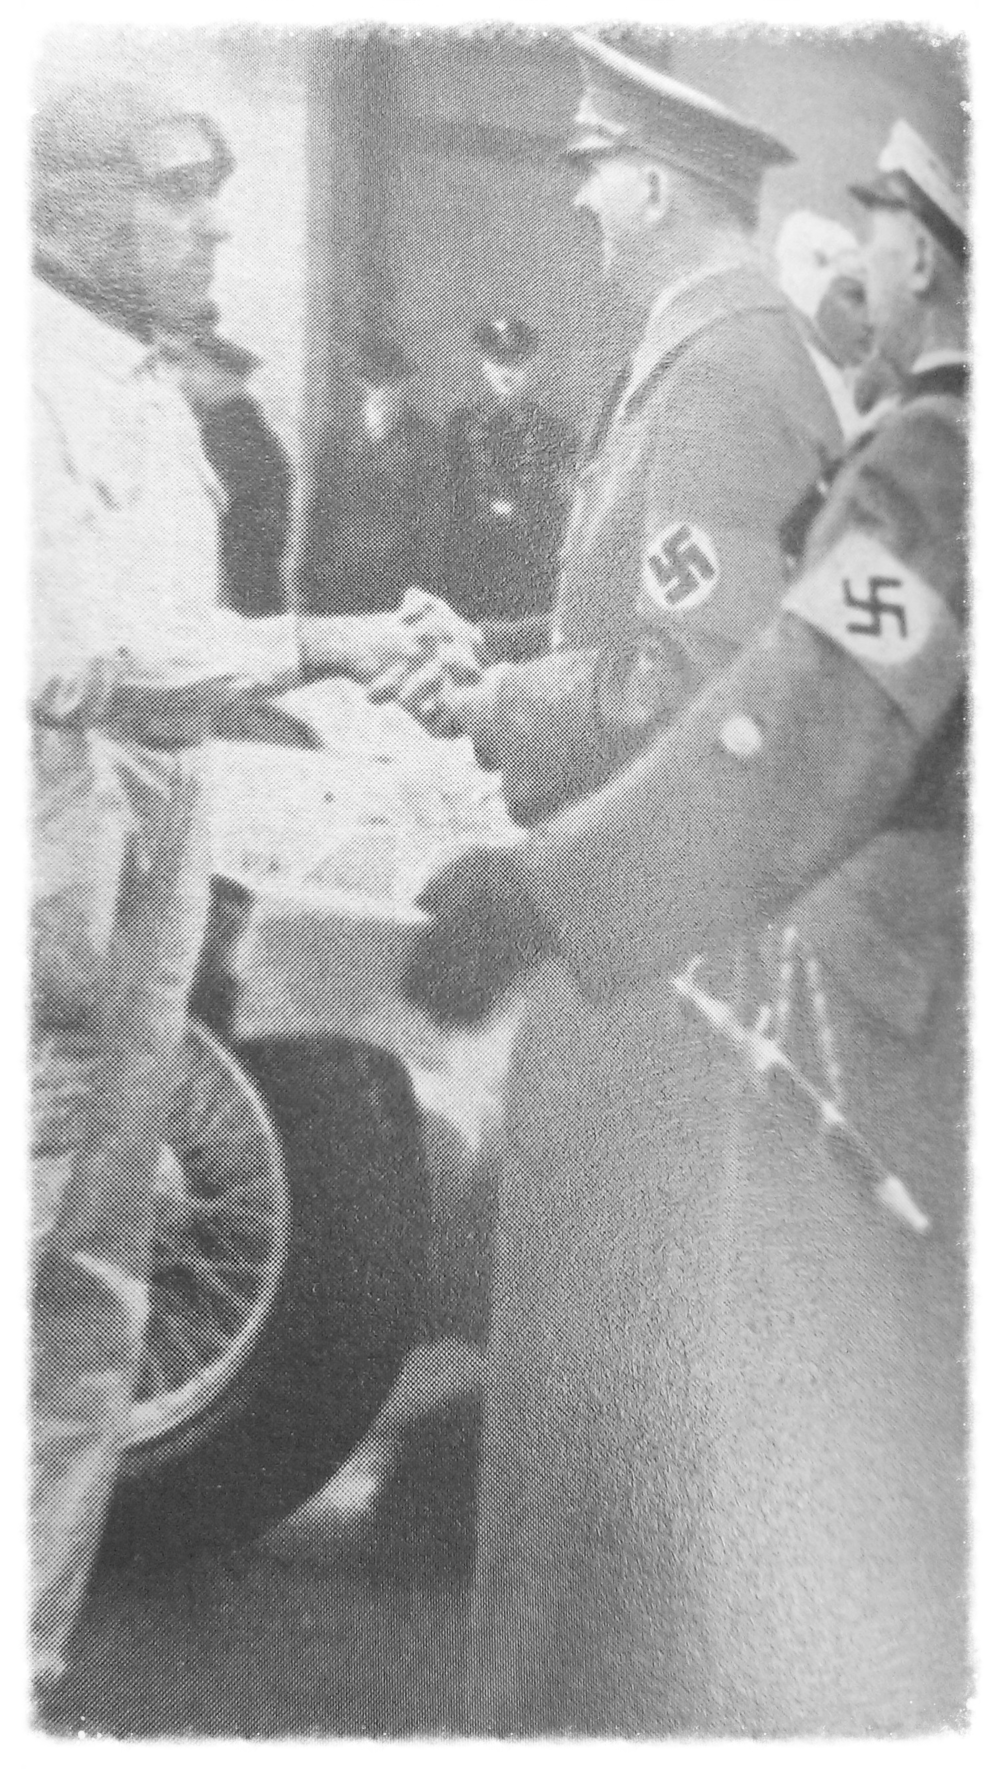 Nuvolar meets Hitler